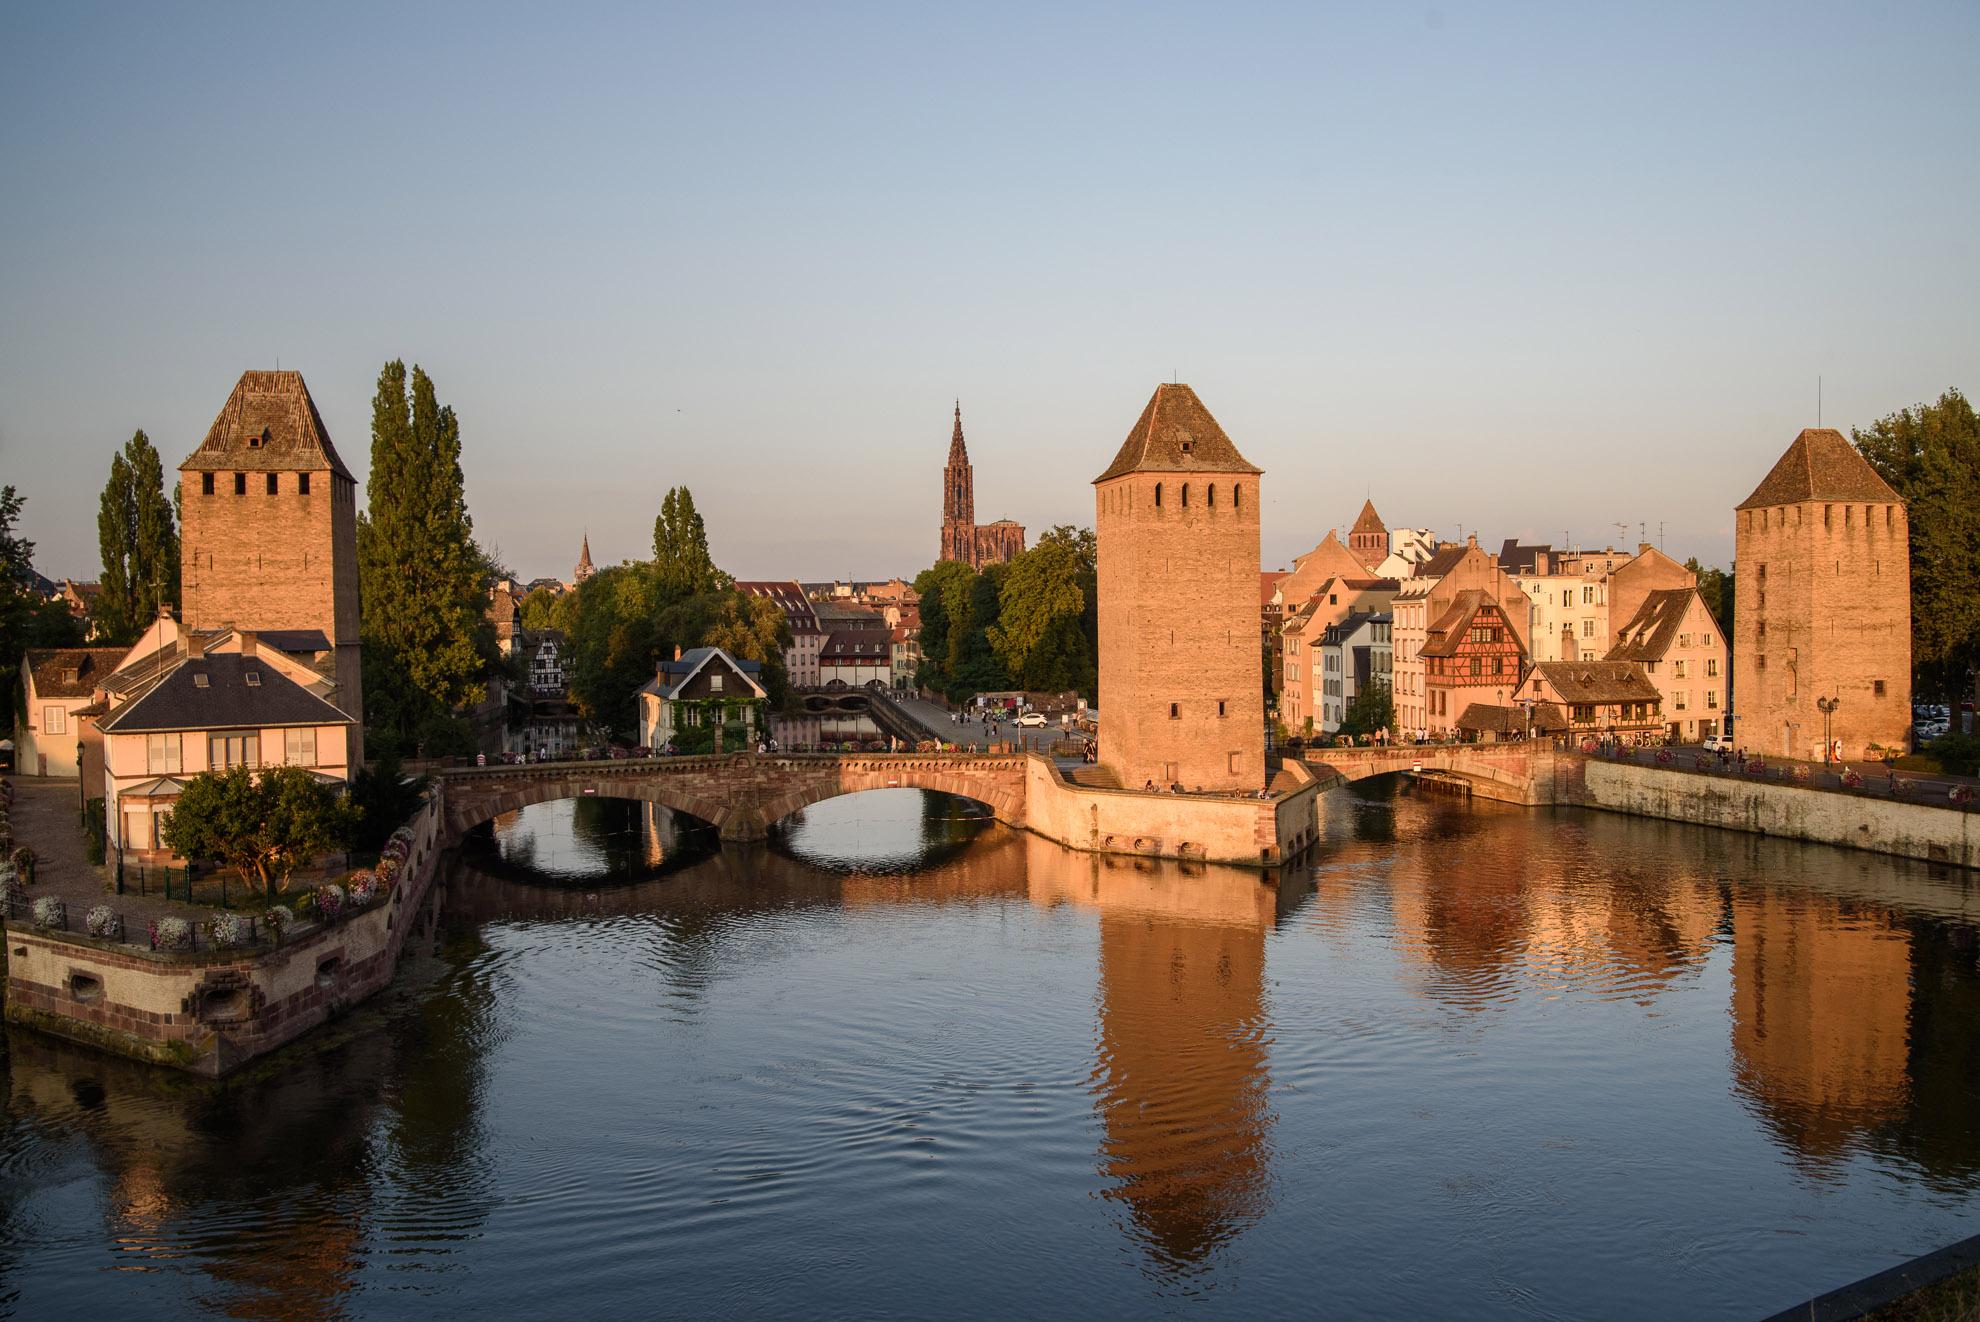 Grande Île - część Strasburga wpisana na listę Unesco